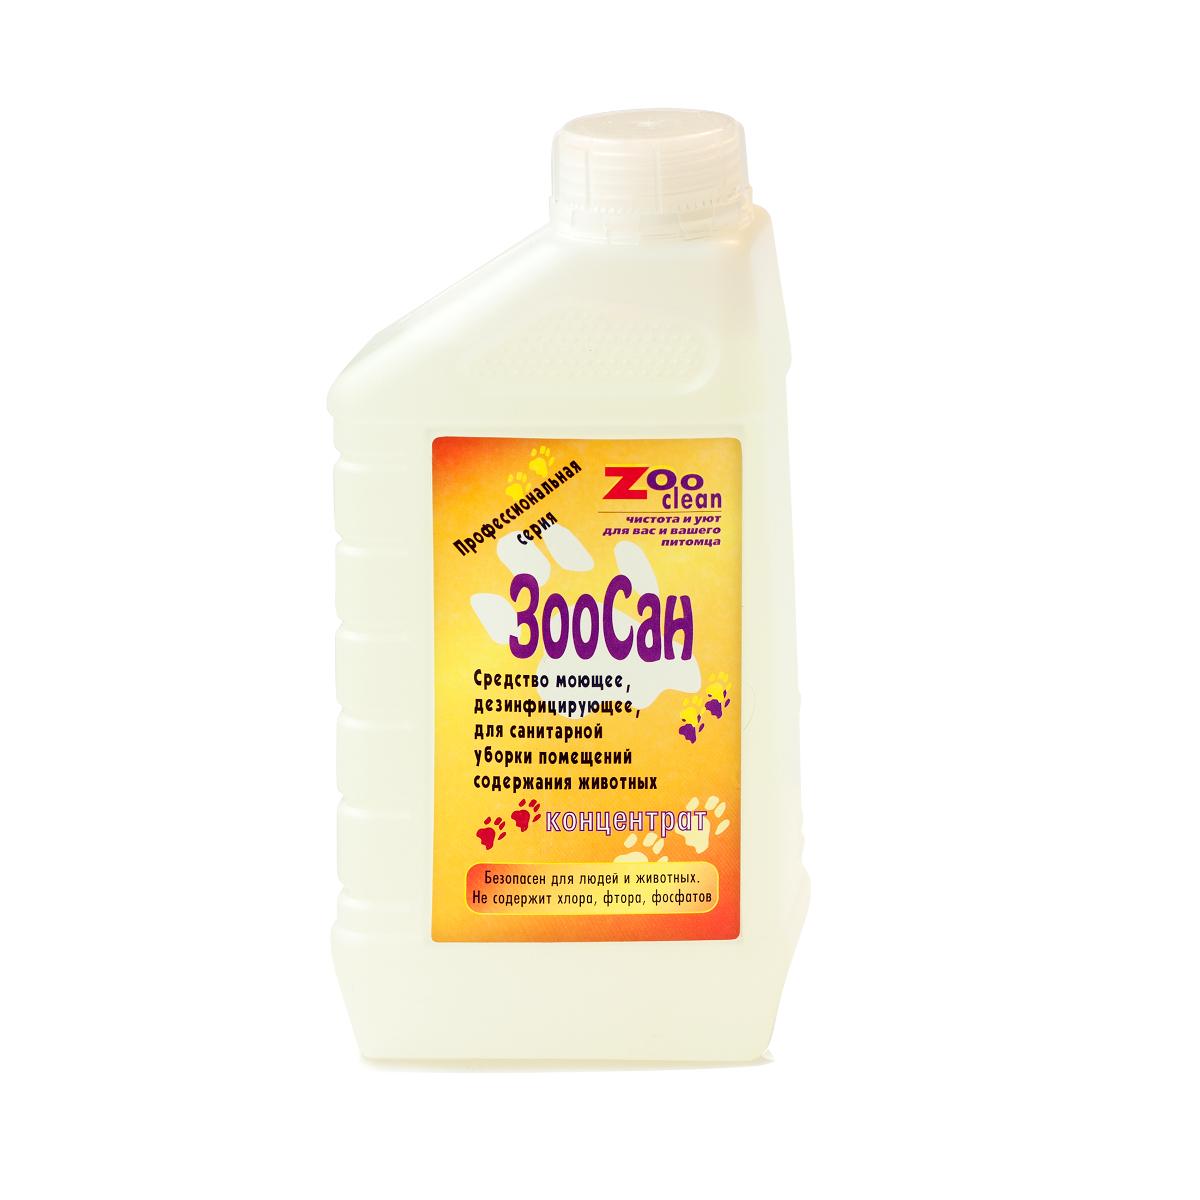 Моющее средство уничтожающее запах ZooClean ЗооСан, 1000мл